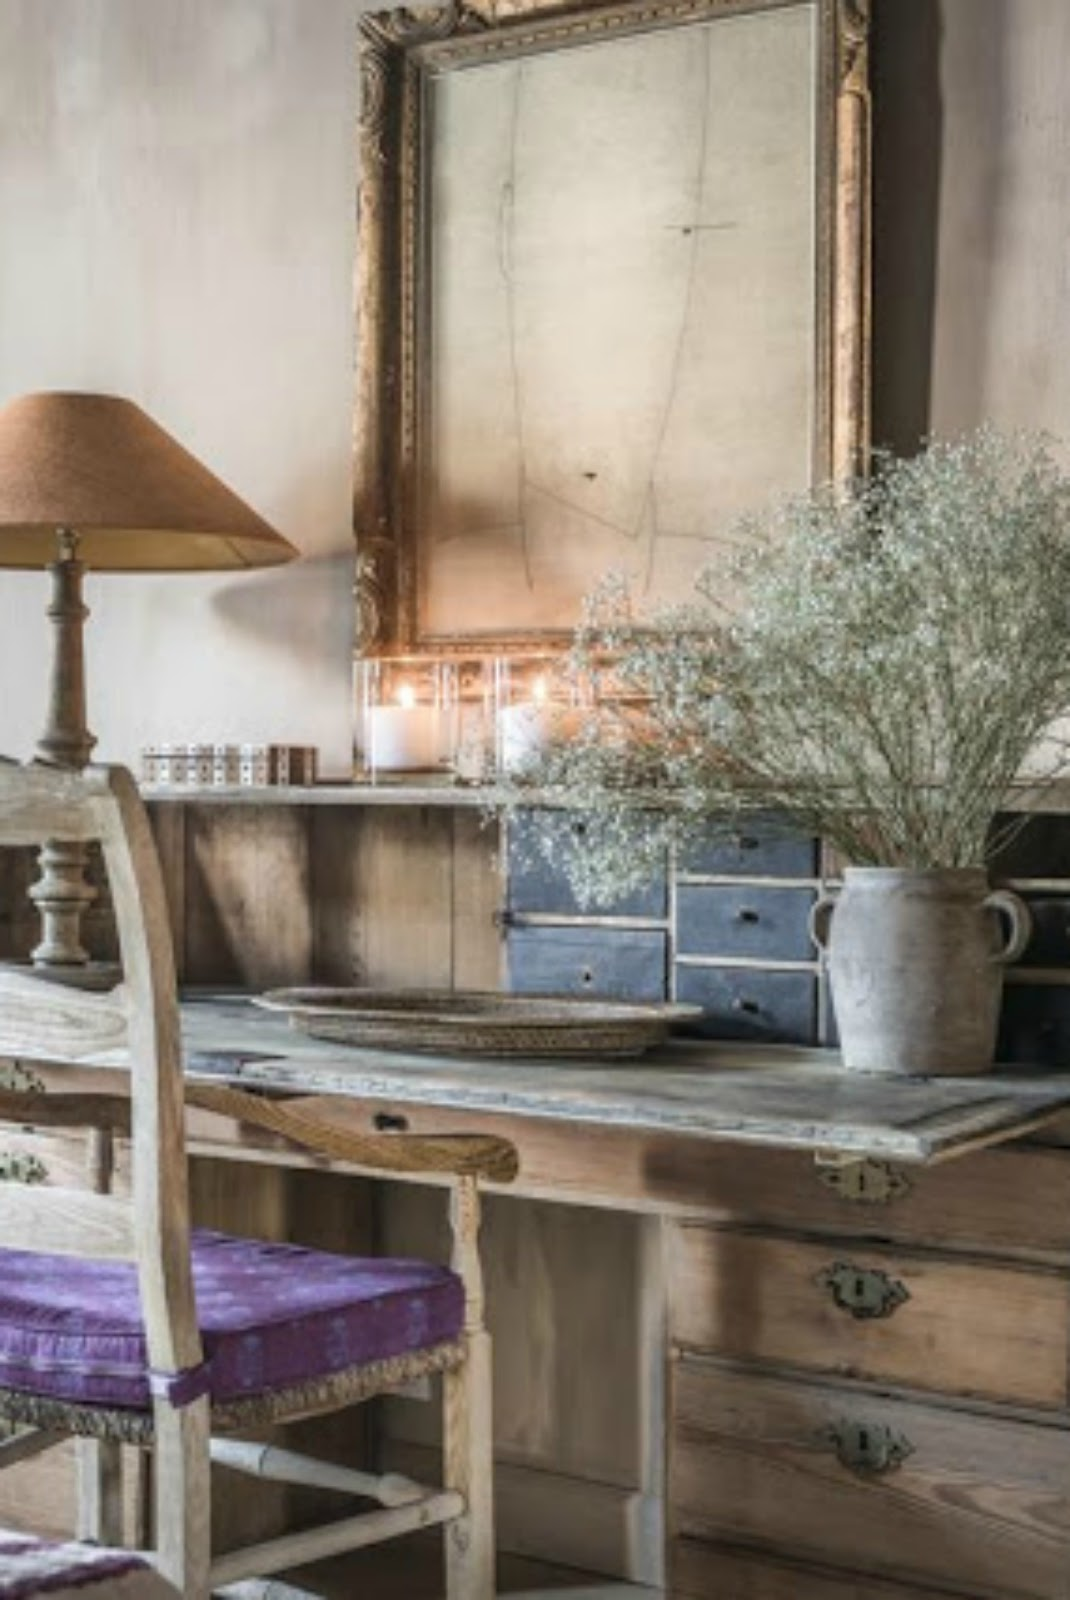 Rustic antique desk in beautiful bedroom with Belgian interior design - found on Hello Lovely Studio